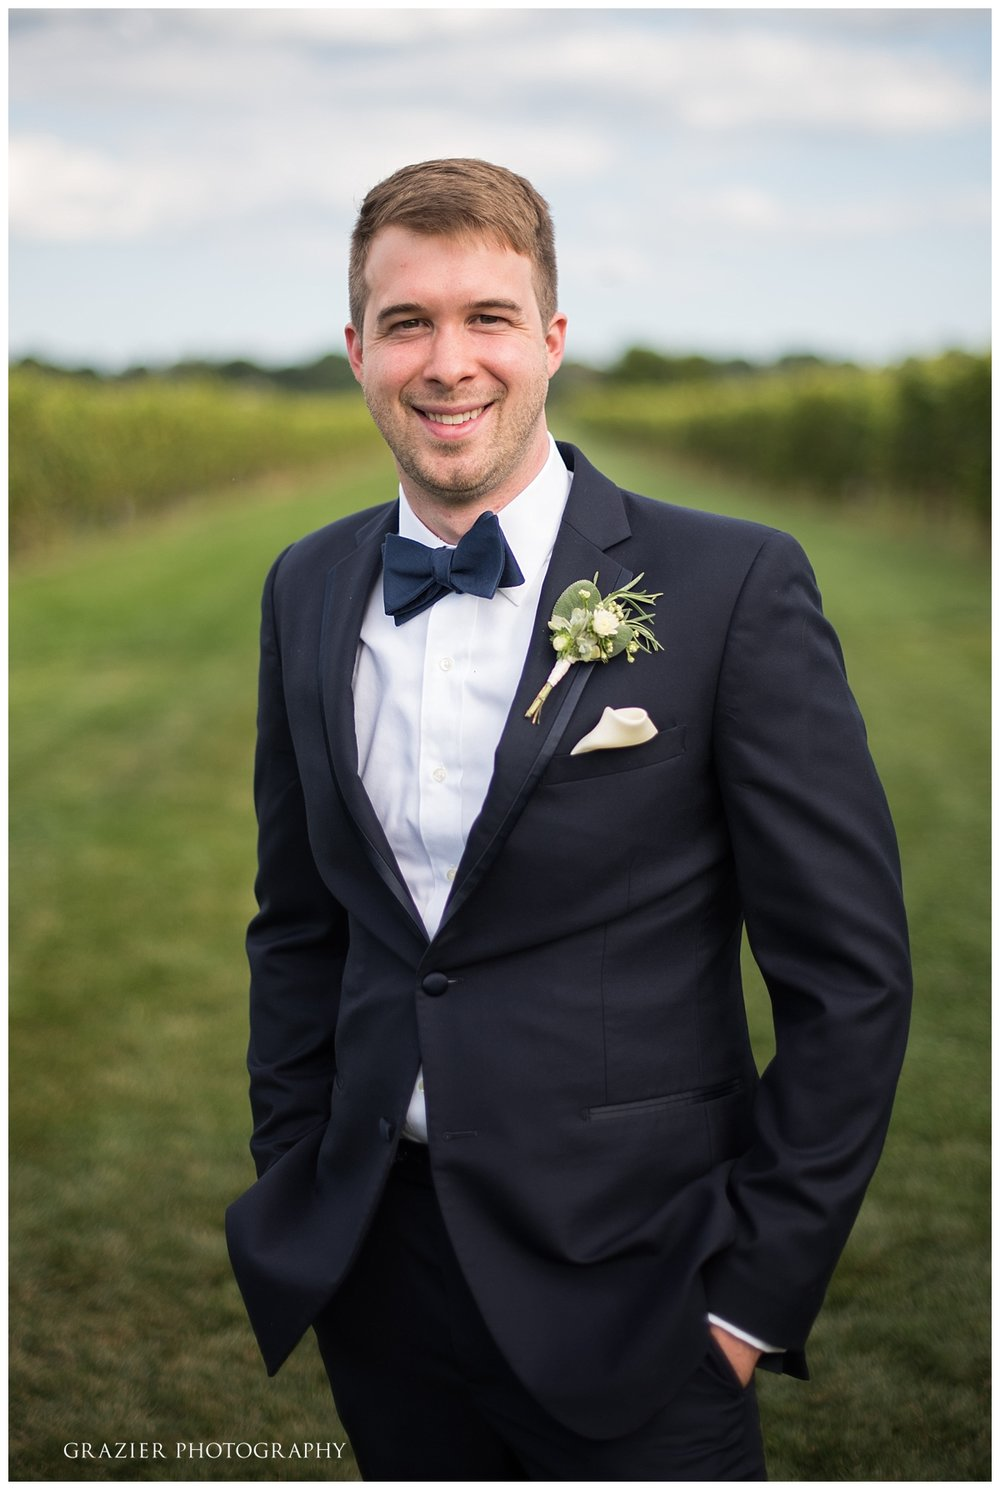 Saltwater Farm Vineyard Wedding Grazier Photography 170825-45_WEB.jpg